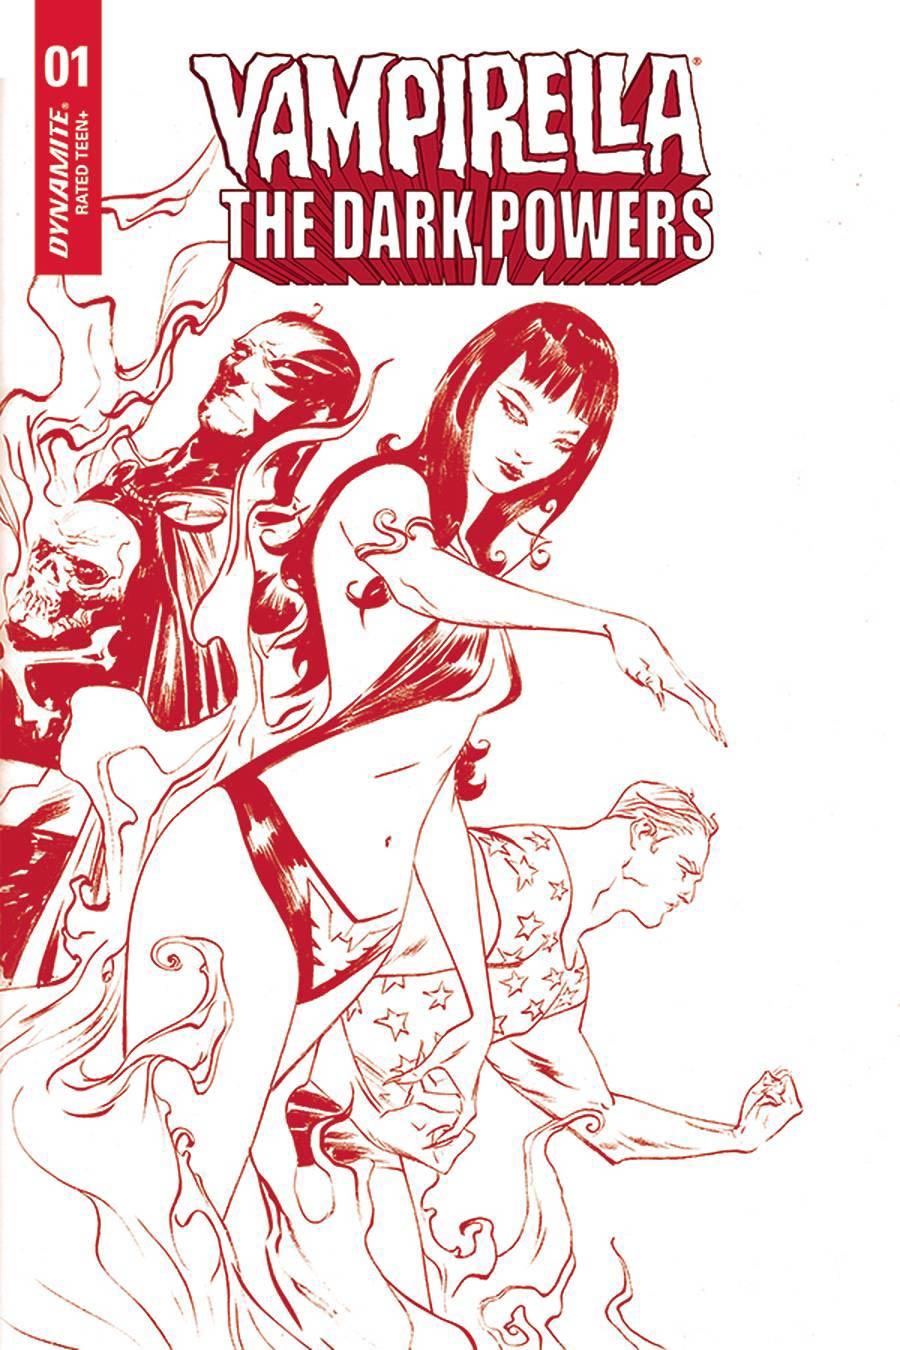 Vampirella The Dark Powers #2 Cover Y Ultra-Premium Limited Edition Jae Lee Crimson Red Line Art Cover